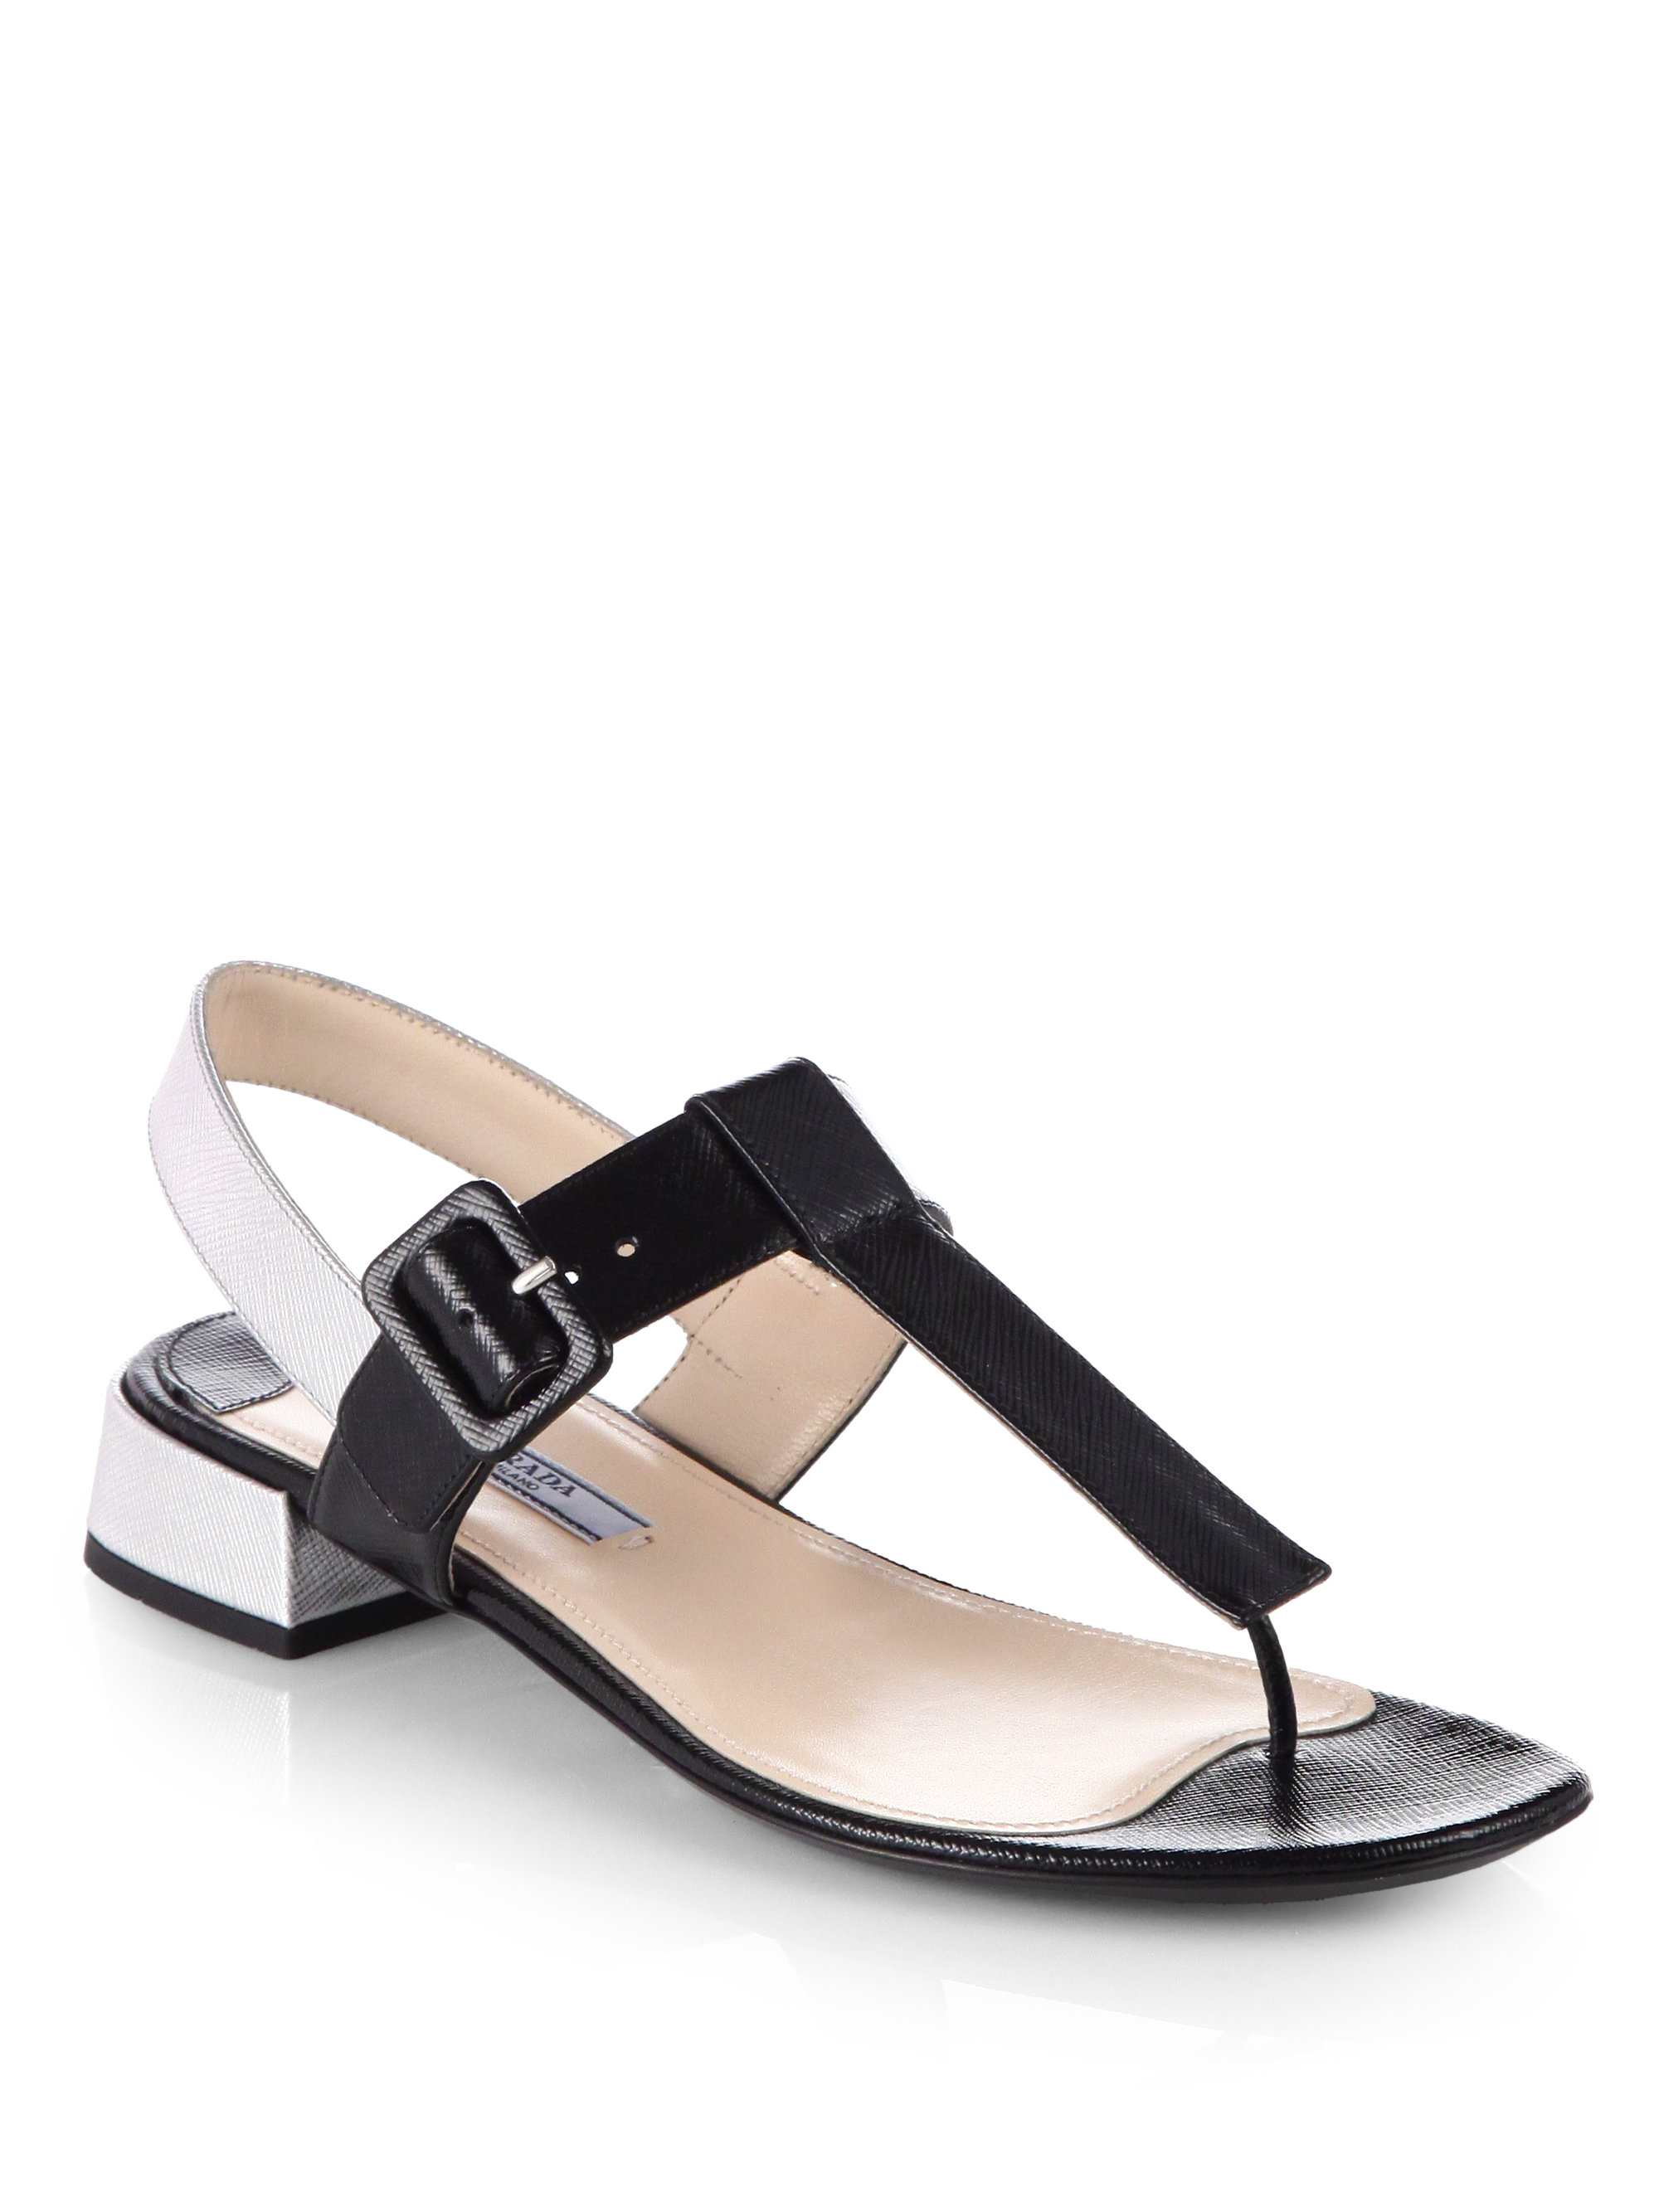 Black Sandals Black Leather Thong Sandals